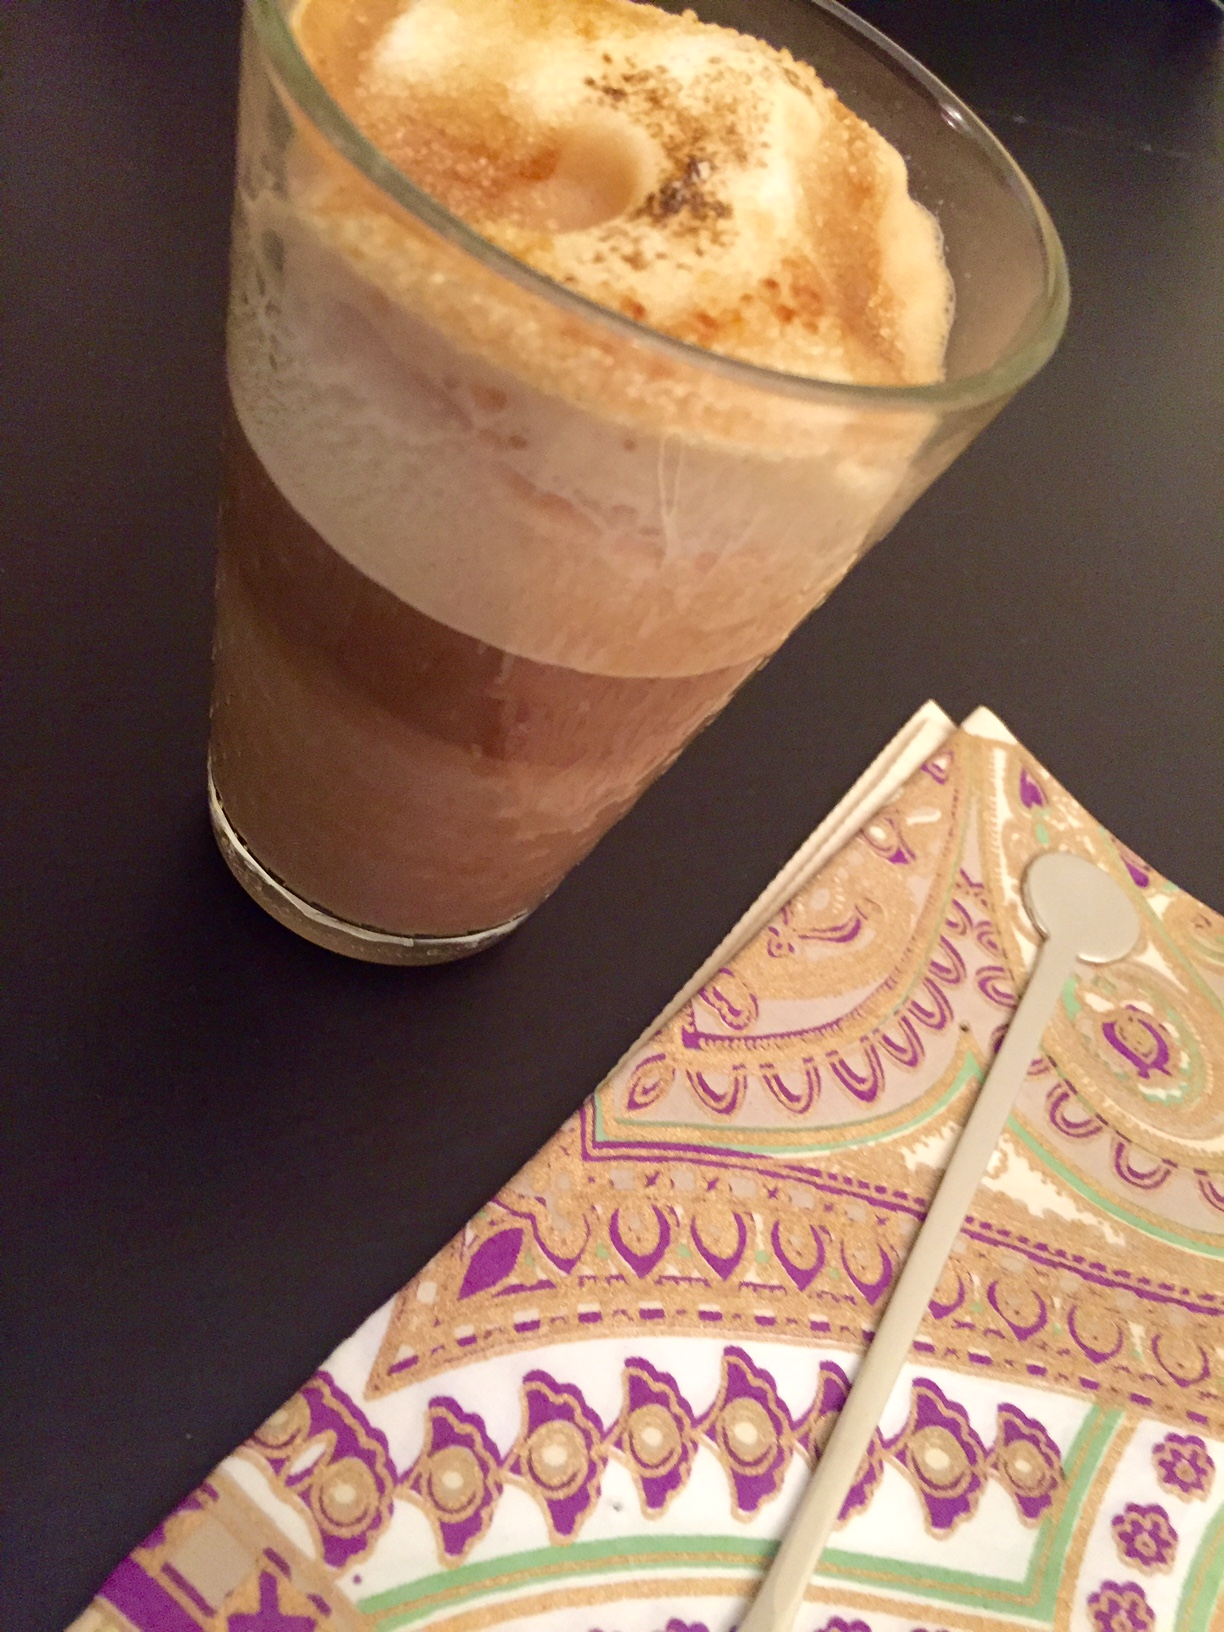 bicchiere-aramel-three-master-nespresso-ricetta-merenda-monsoon malabar-non-si-dice-piacere-ricevere-ospiti-blog-buone-maniere.jpg